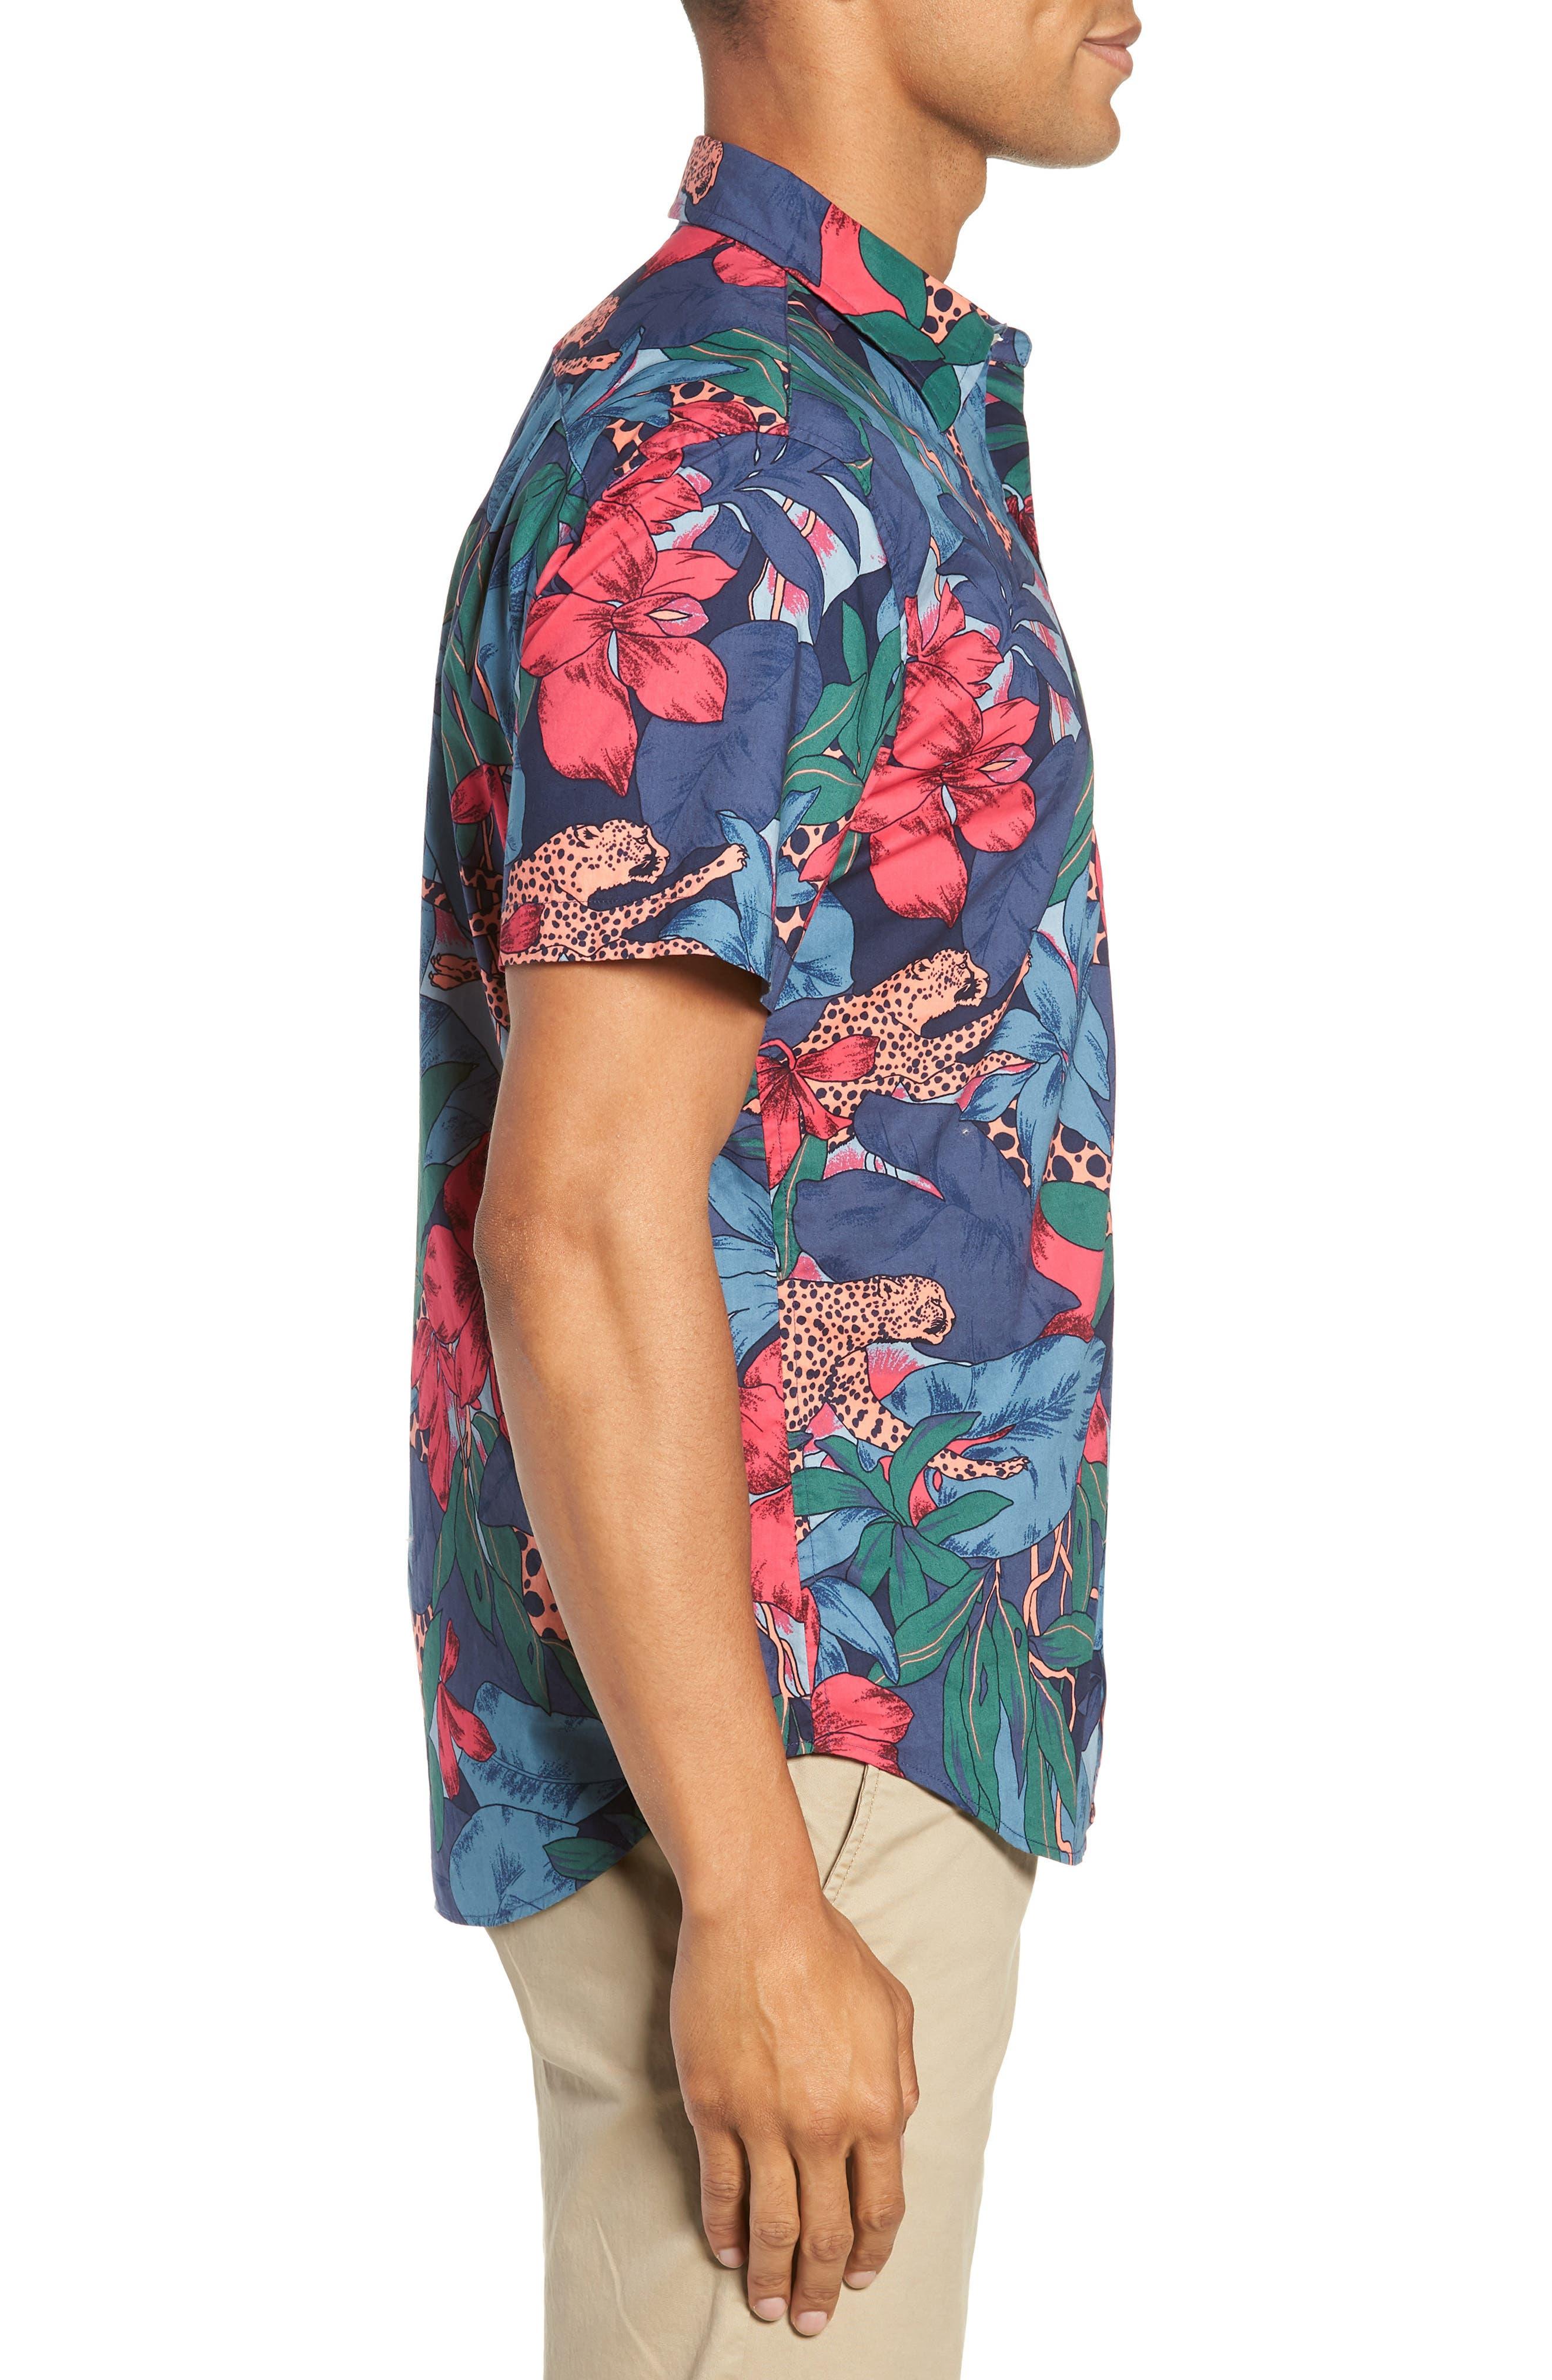 Riviera Slim Fit Leopard Floral Sport Shirt,                             Alternate thumbnail 4, color,                             WILD CATS - PEACH TWIG